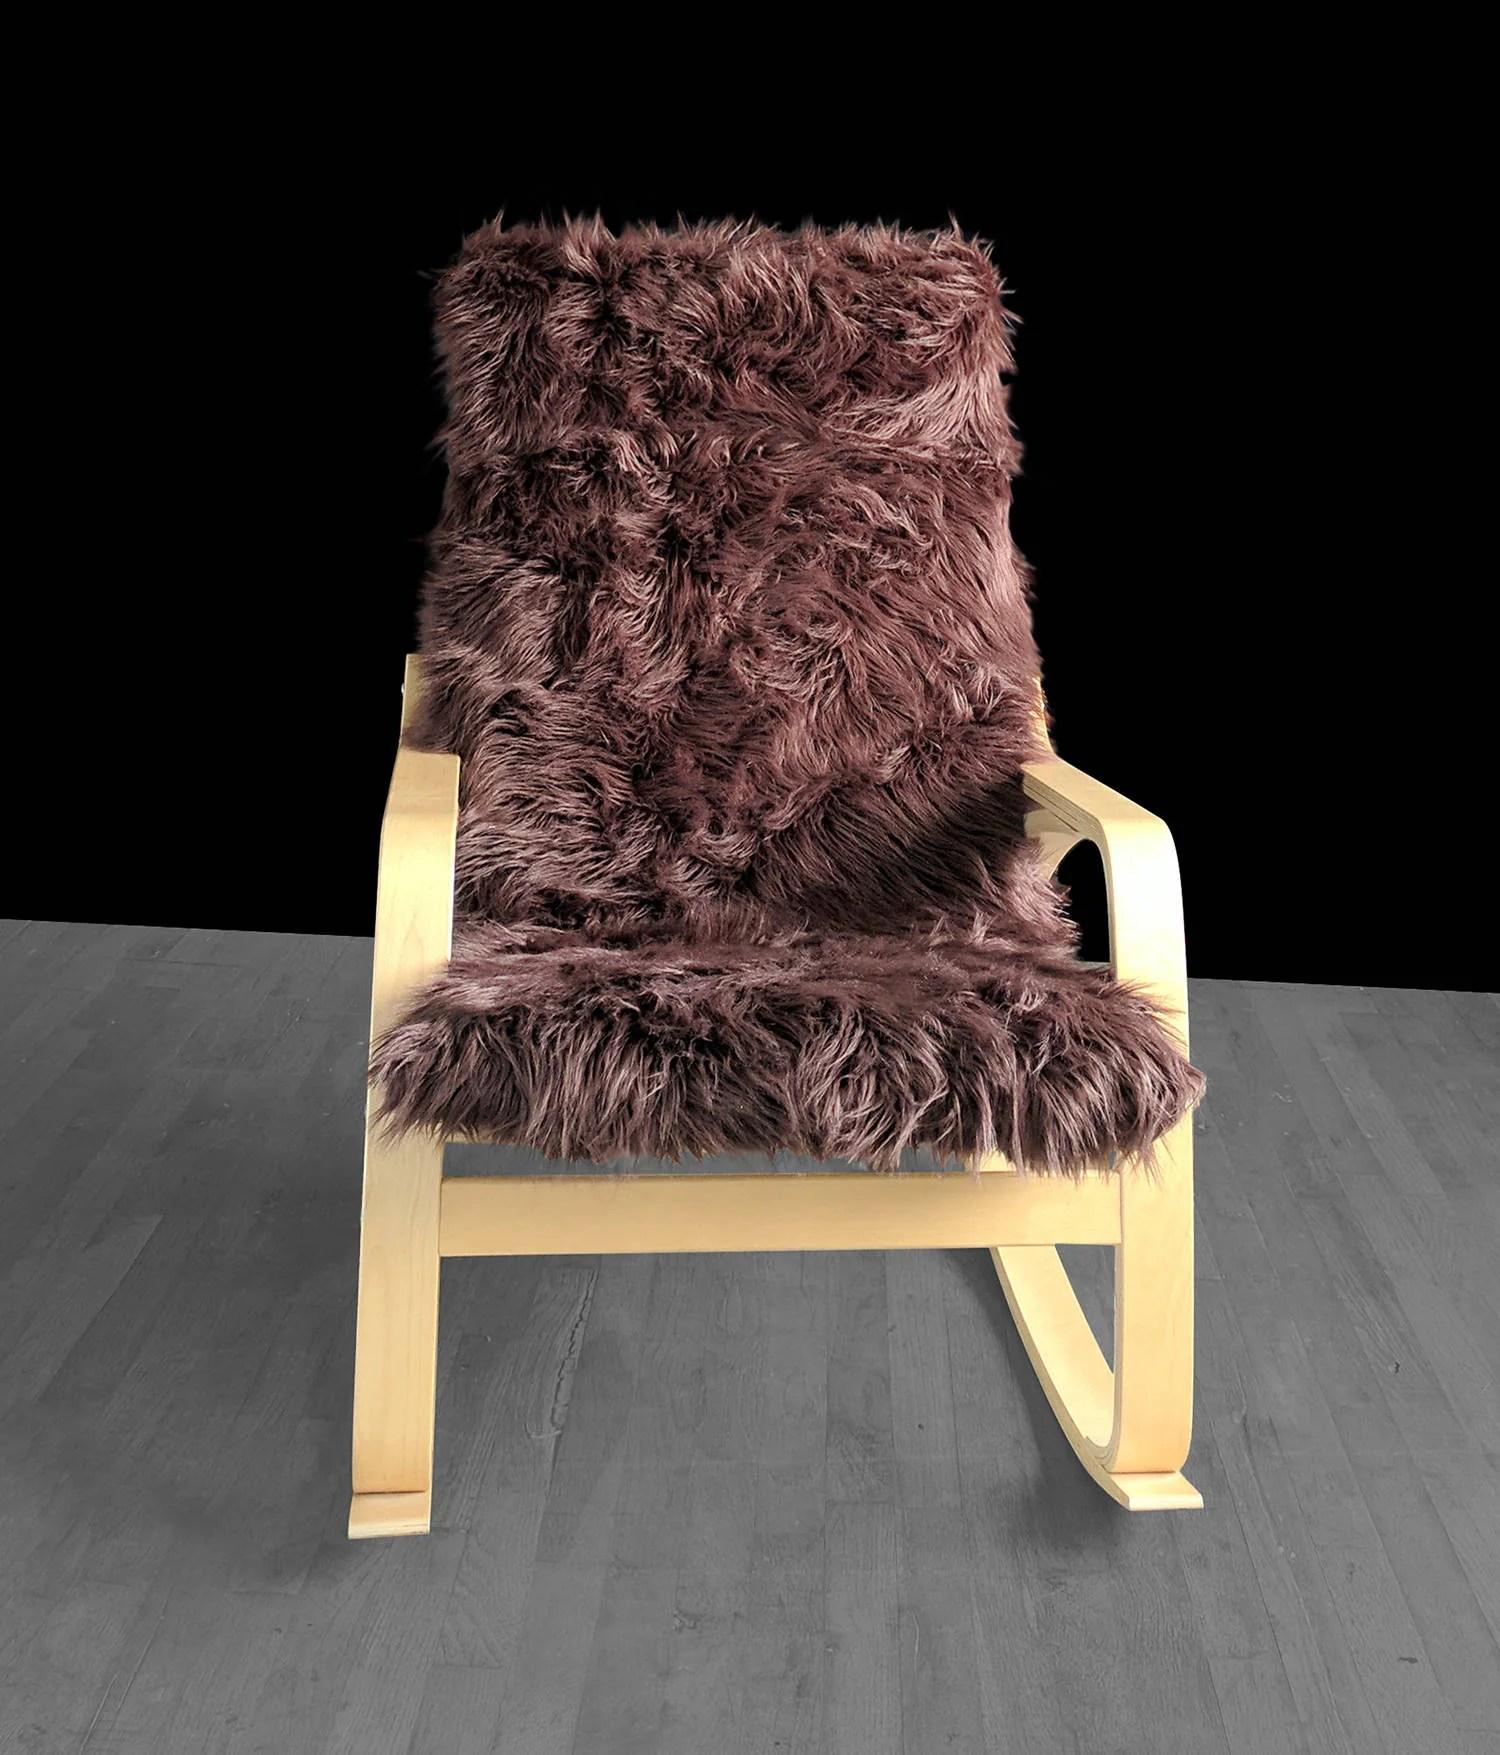 fur chair cover old cast iron garden chairs brown ikea poÄng cushion slipcover custom